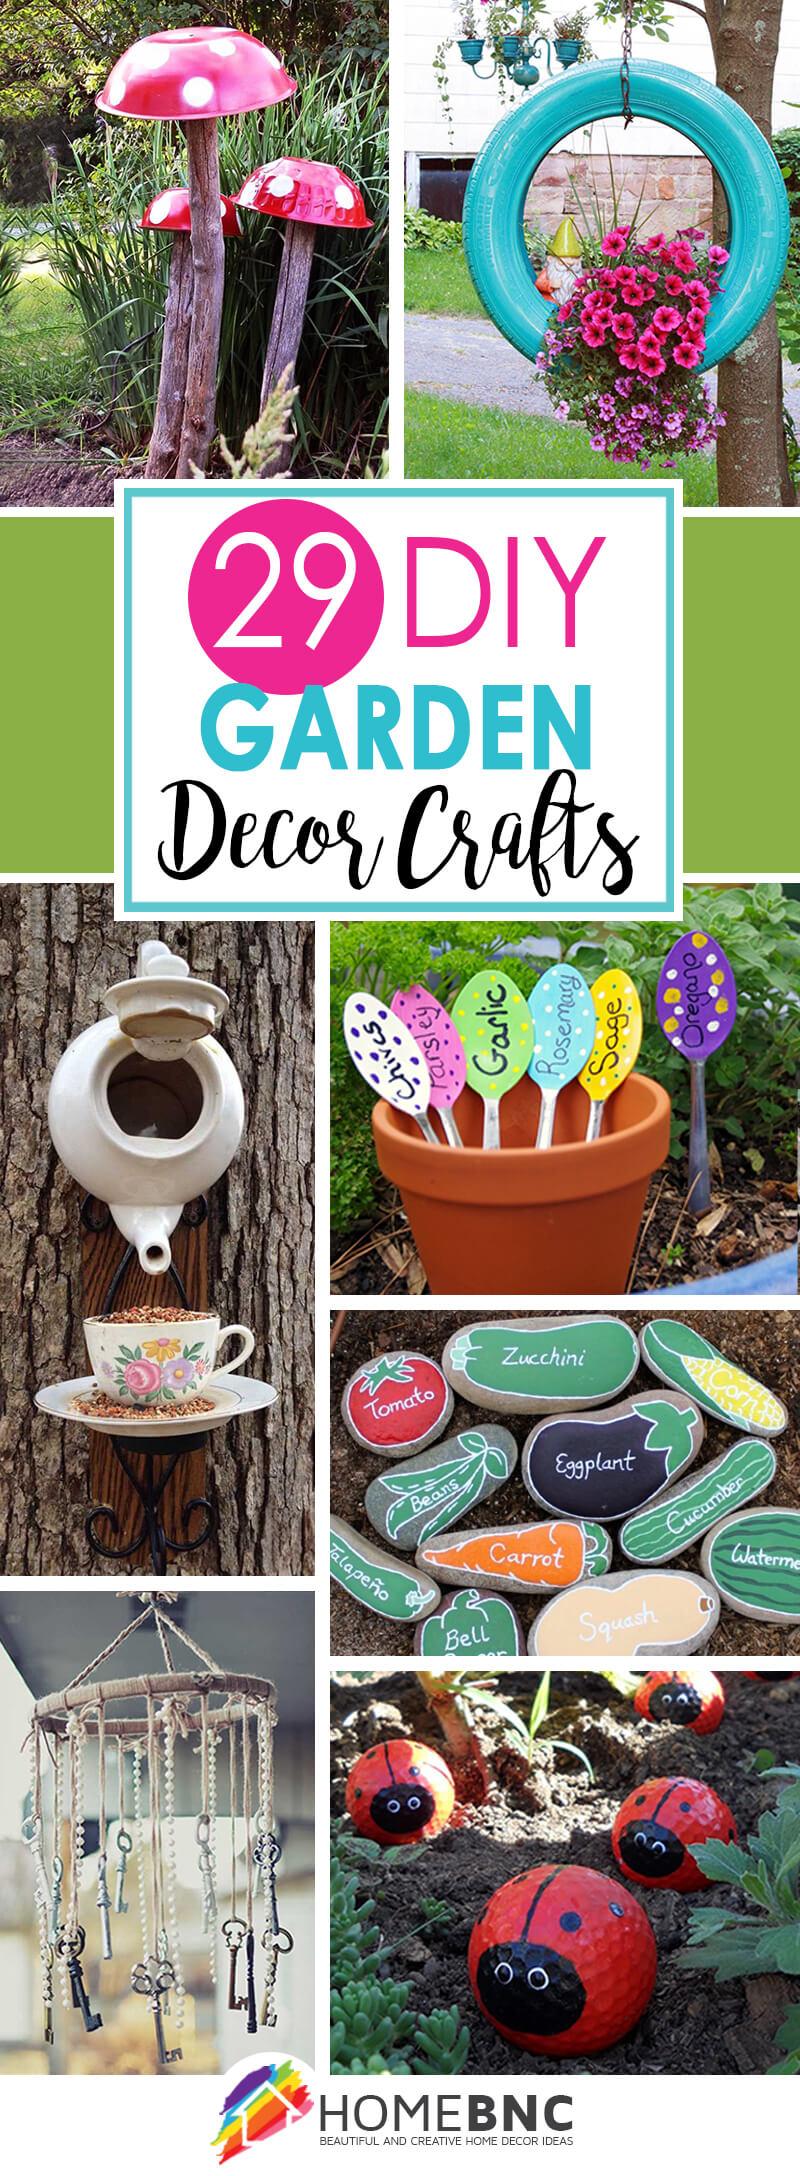 29 Best DIY Garden Crafts (Ideas and Designs) for 2020 on Handmade Diy Garden Decor  id=65518